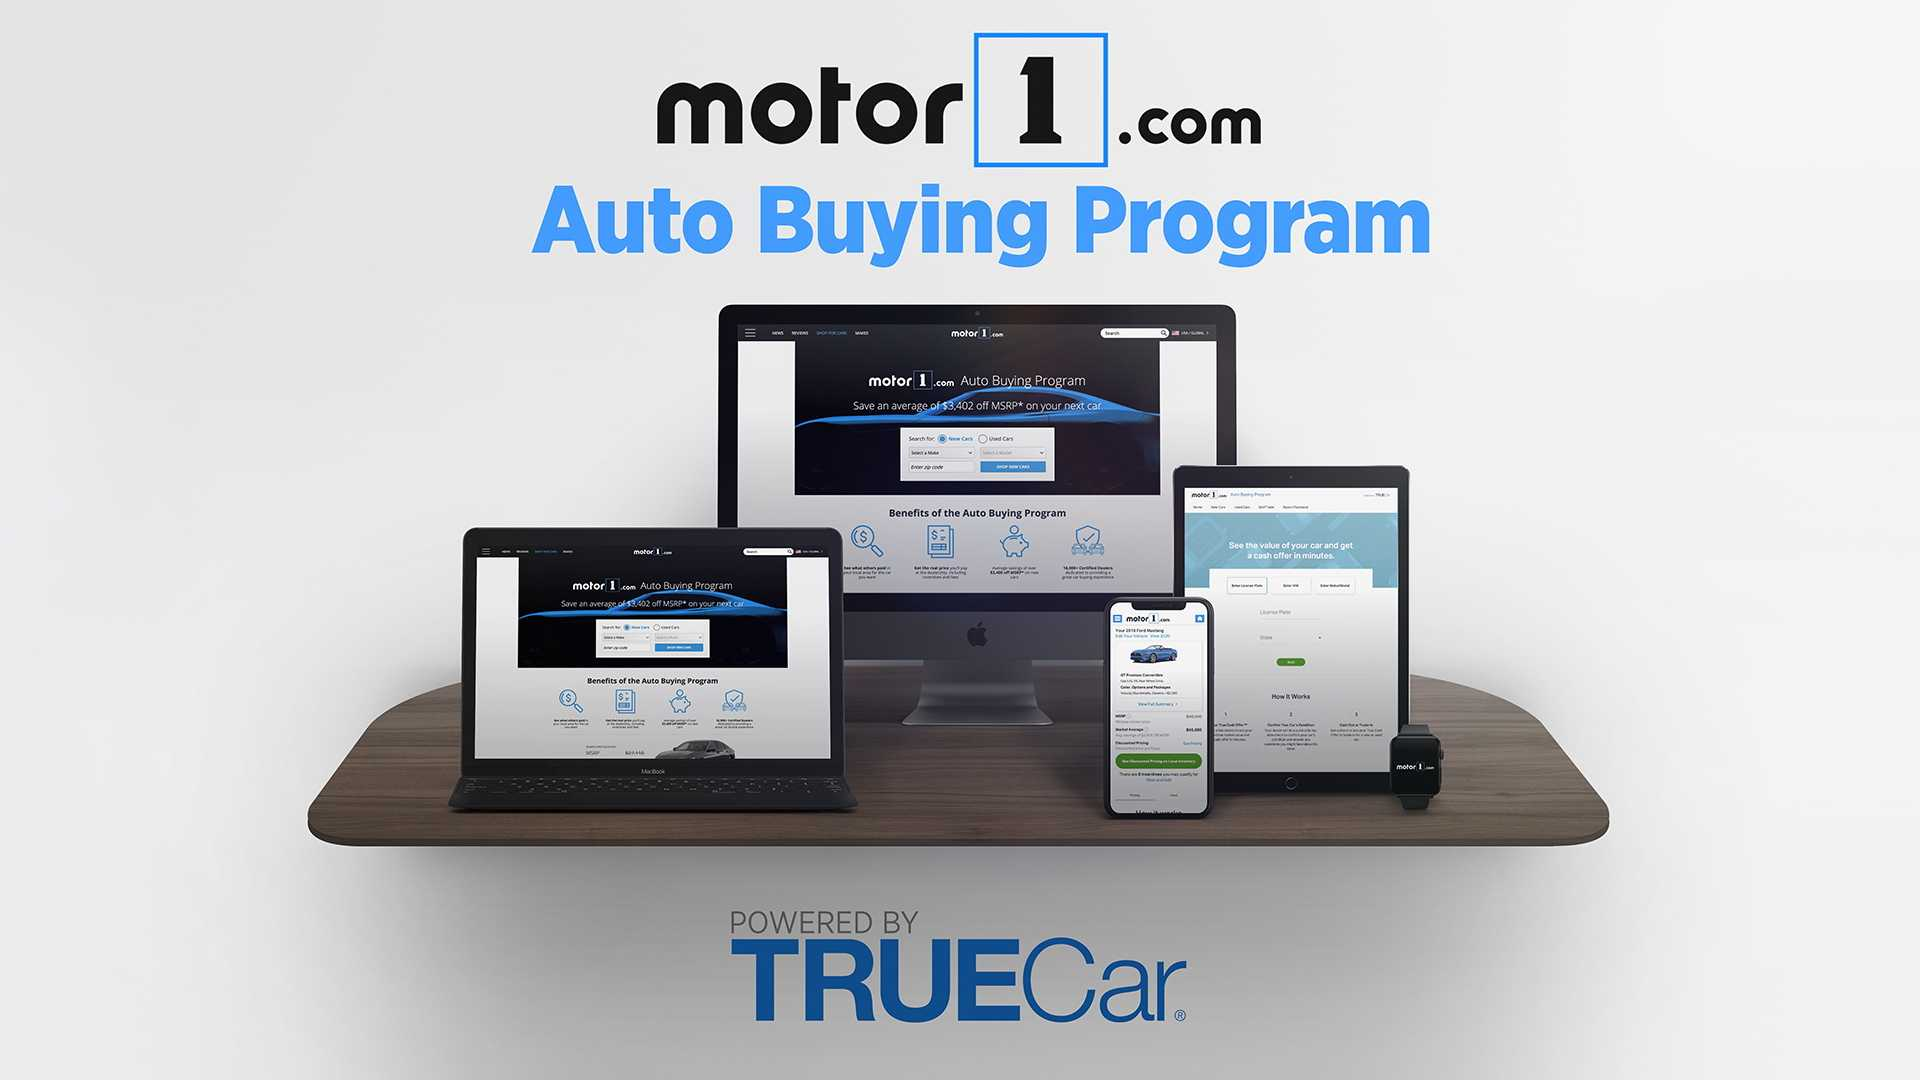 Motor1.com And TrueCar Partner To Launch New Auto Buying Program